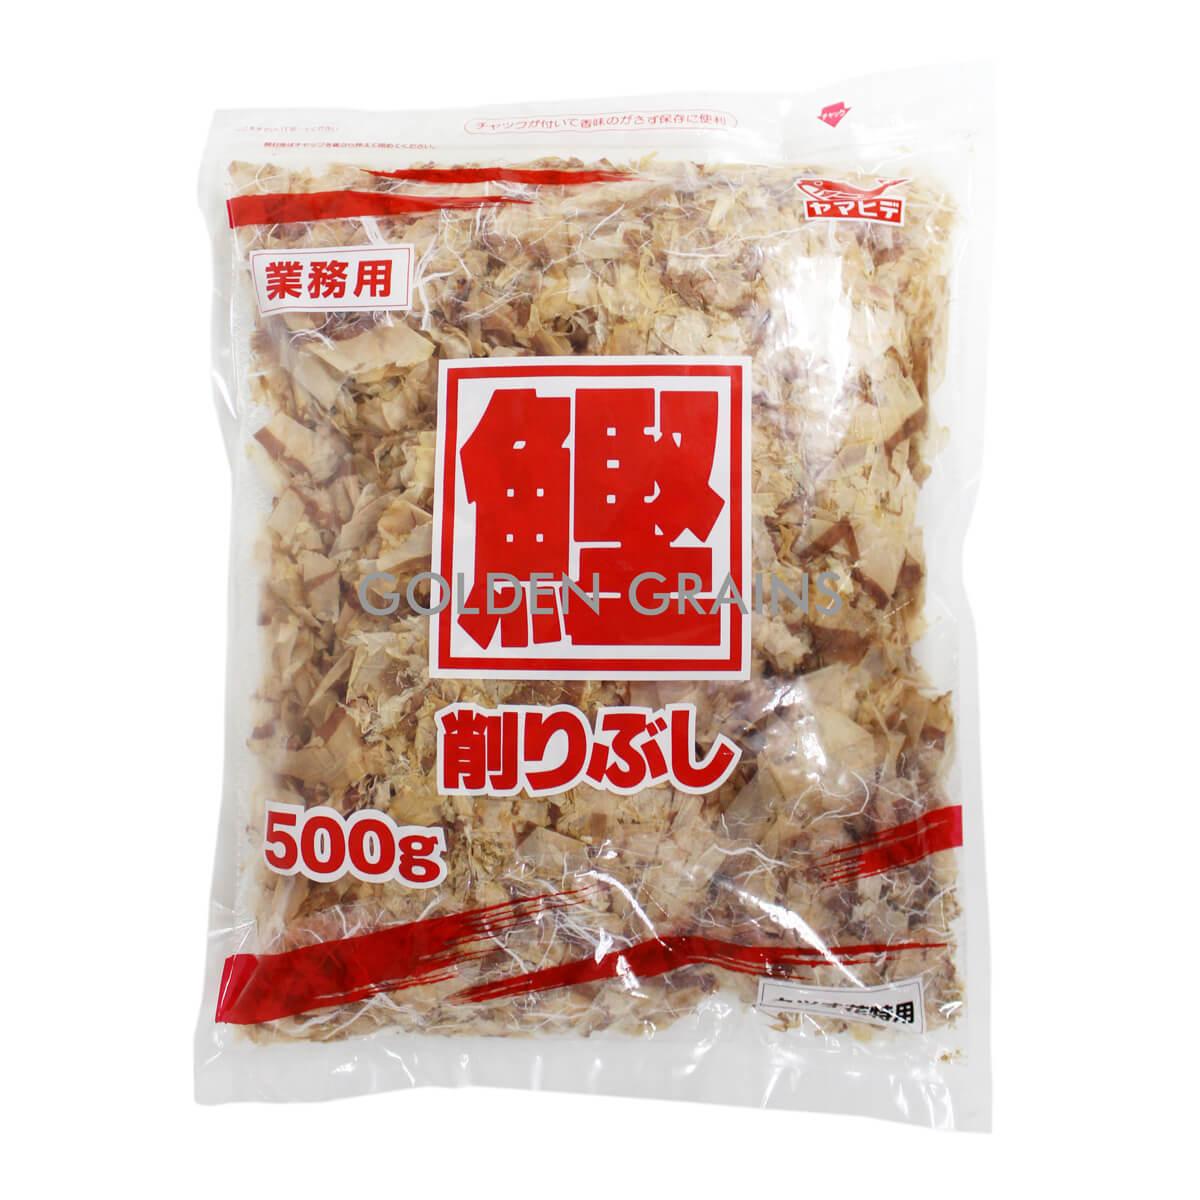 Golden Grains Yamahide - Bonito - Front.jpg